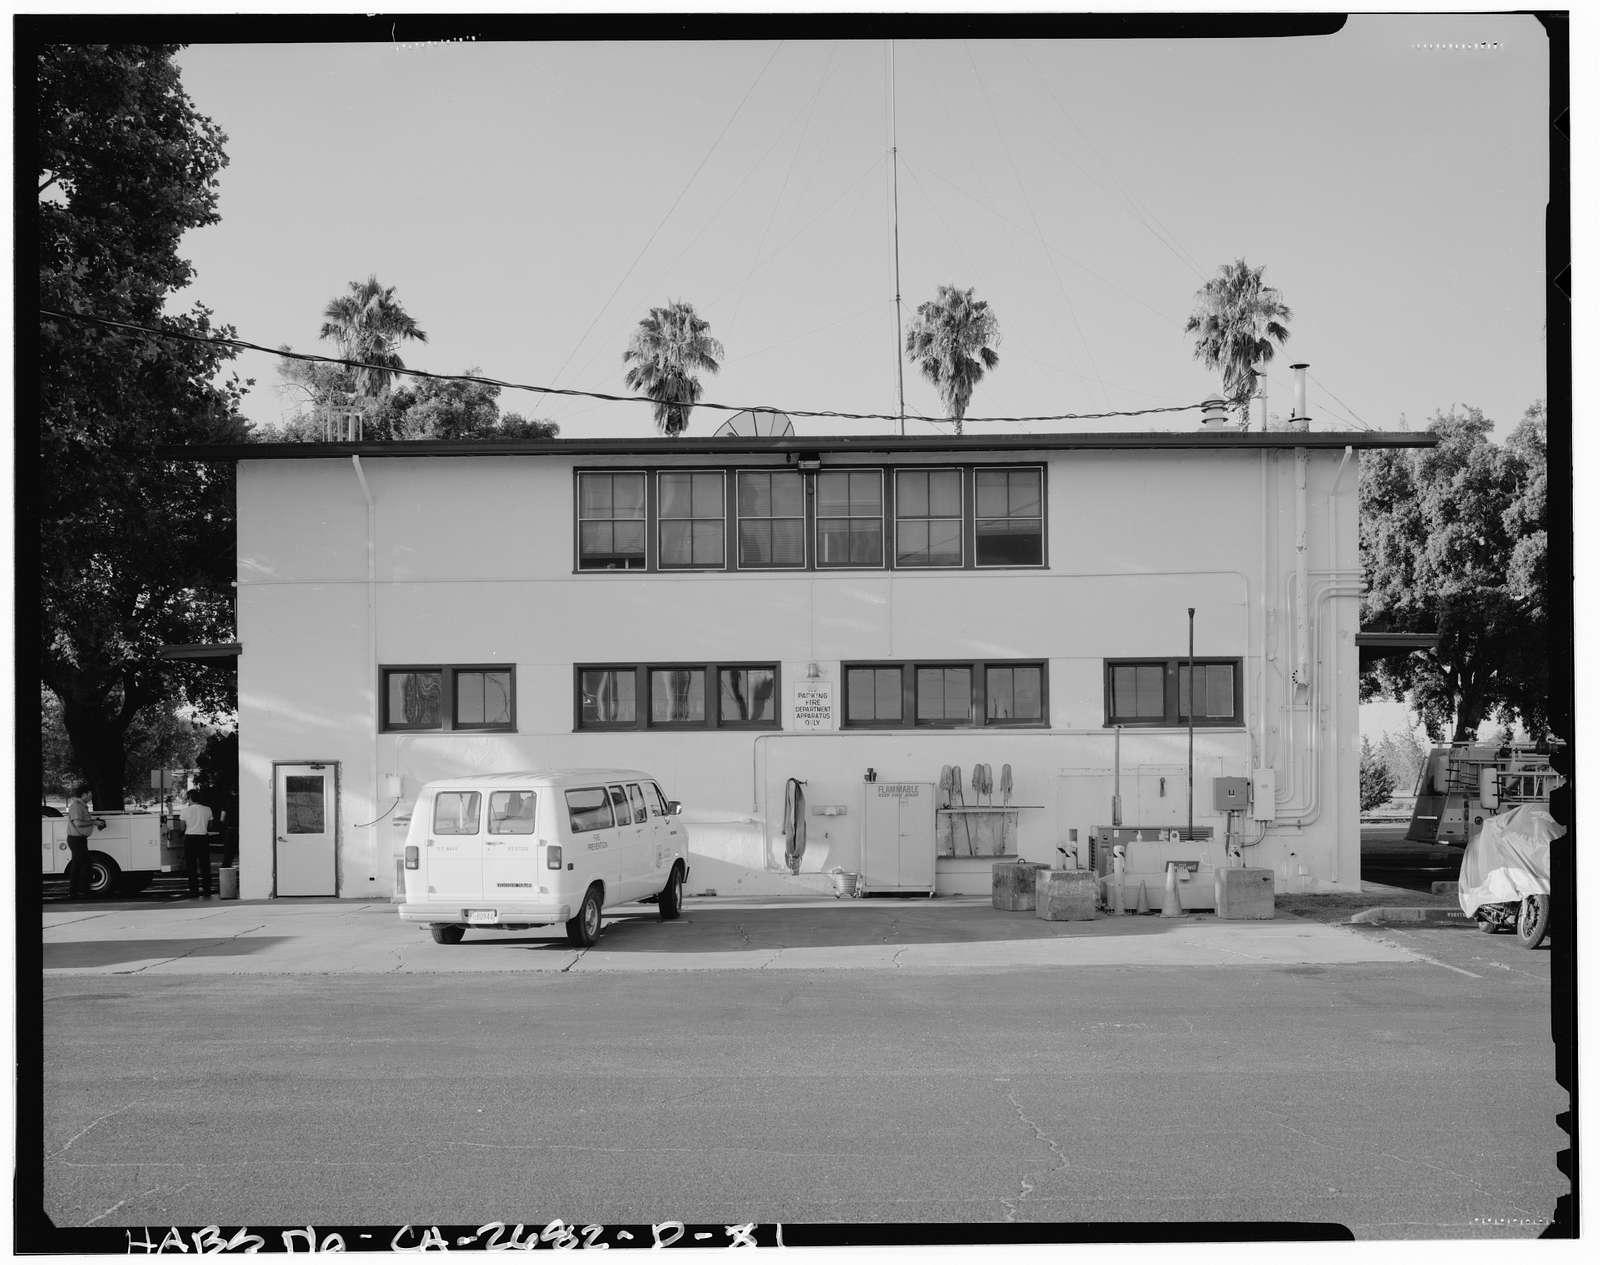 Naval Supply Annex Stockton, Fire Station, Northeast corner of Fyffe Avenue & James Drive, Stockton, San Joaquin County, CA